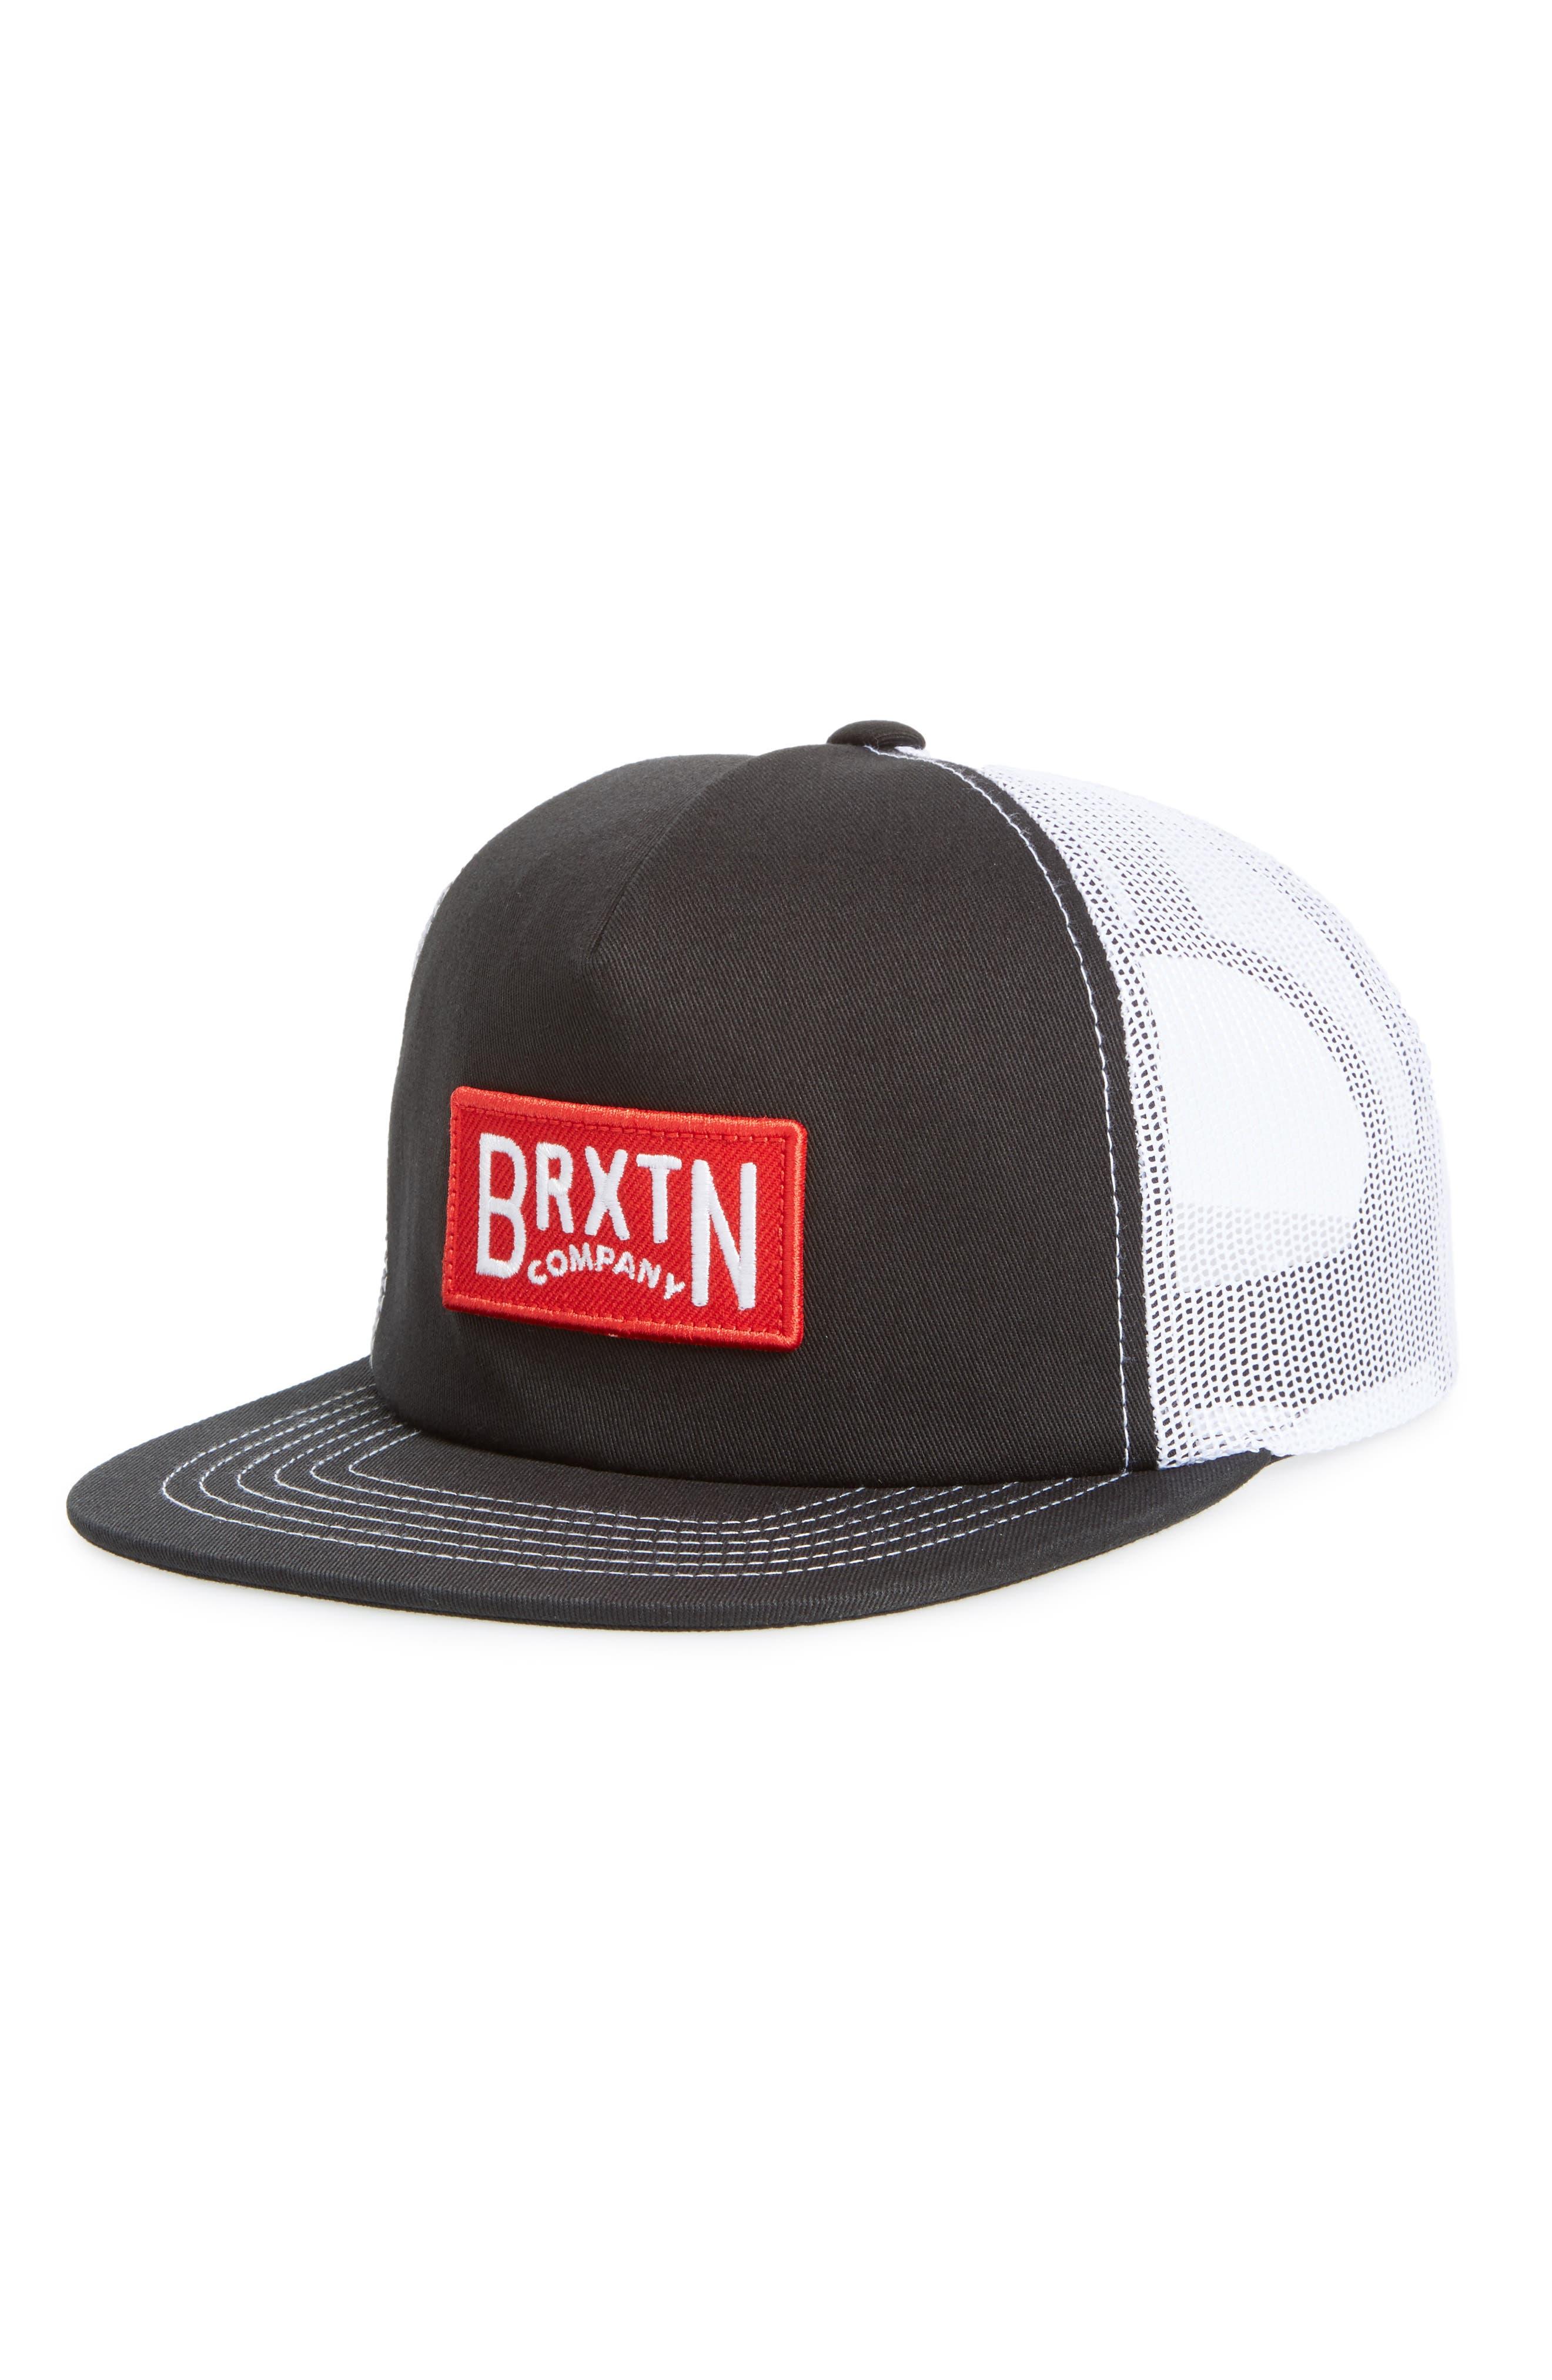 BRIXTON Langley Trucker Hat